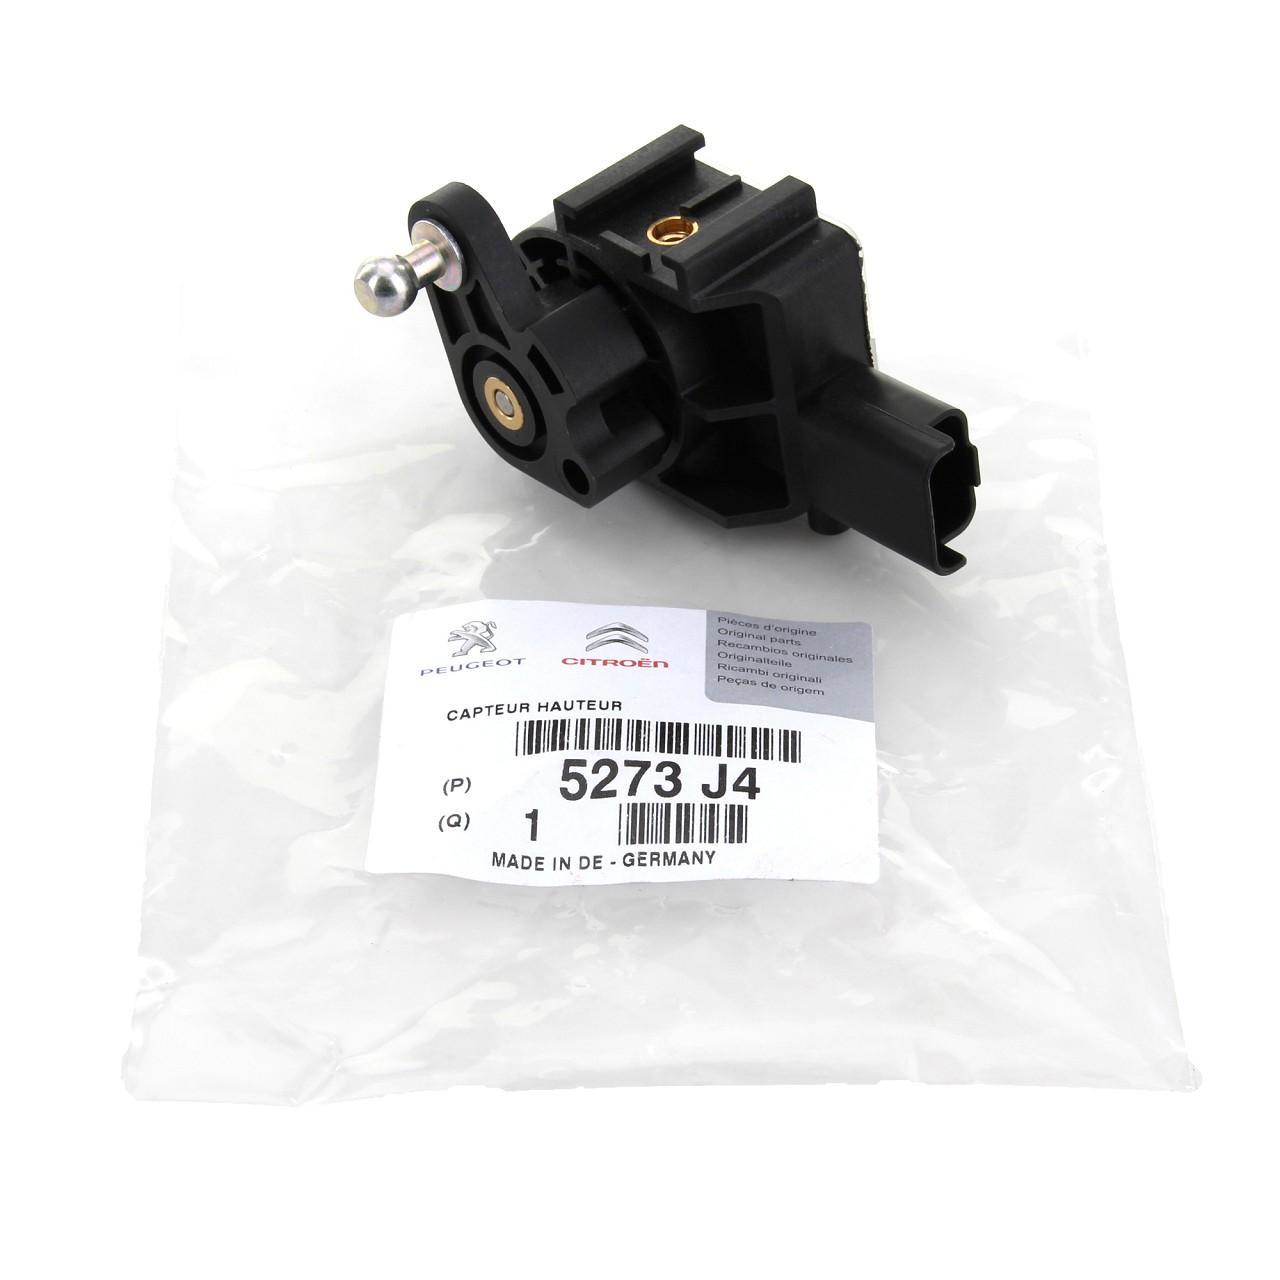 ORIGINAL Peugeot Sensor Leuchtweitenregulierung Höhenstandssensor 508 5273.J4